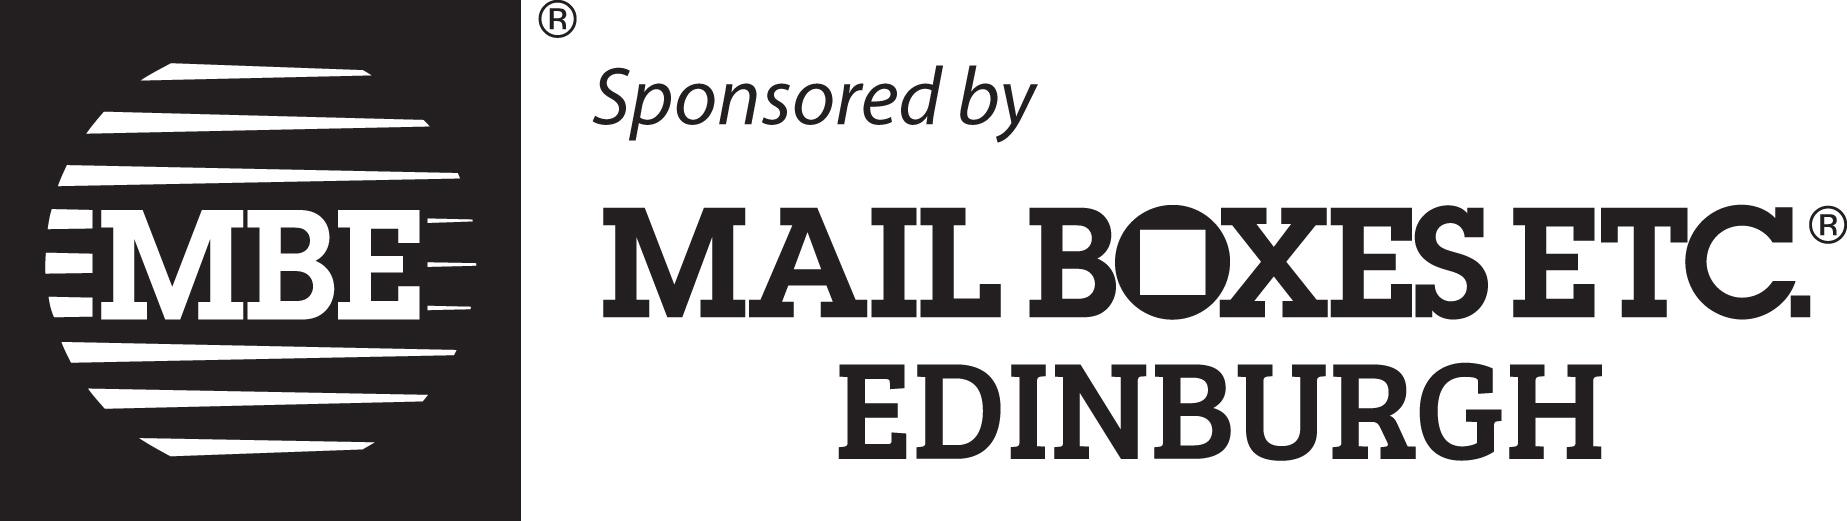 MBE Logo Horizontal Sponsored by Edinburgh.jpg